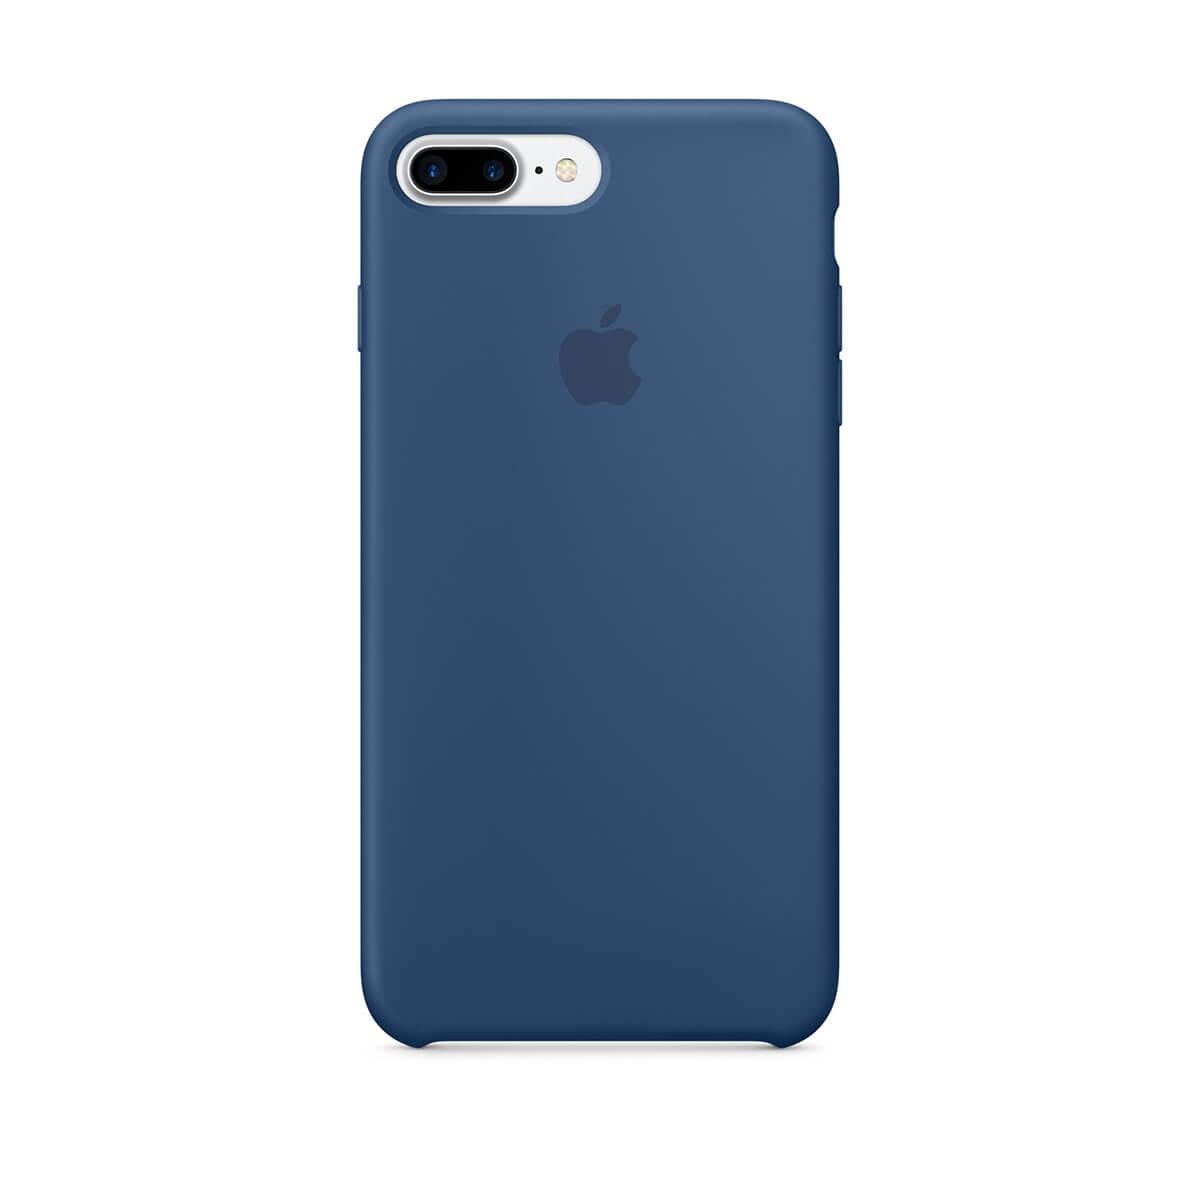 Silikonový kryt na iPhone 7 Plus – mořsky modrý mmqx2zm/a